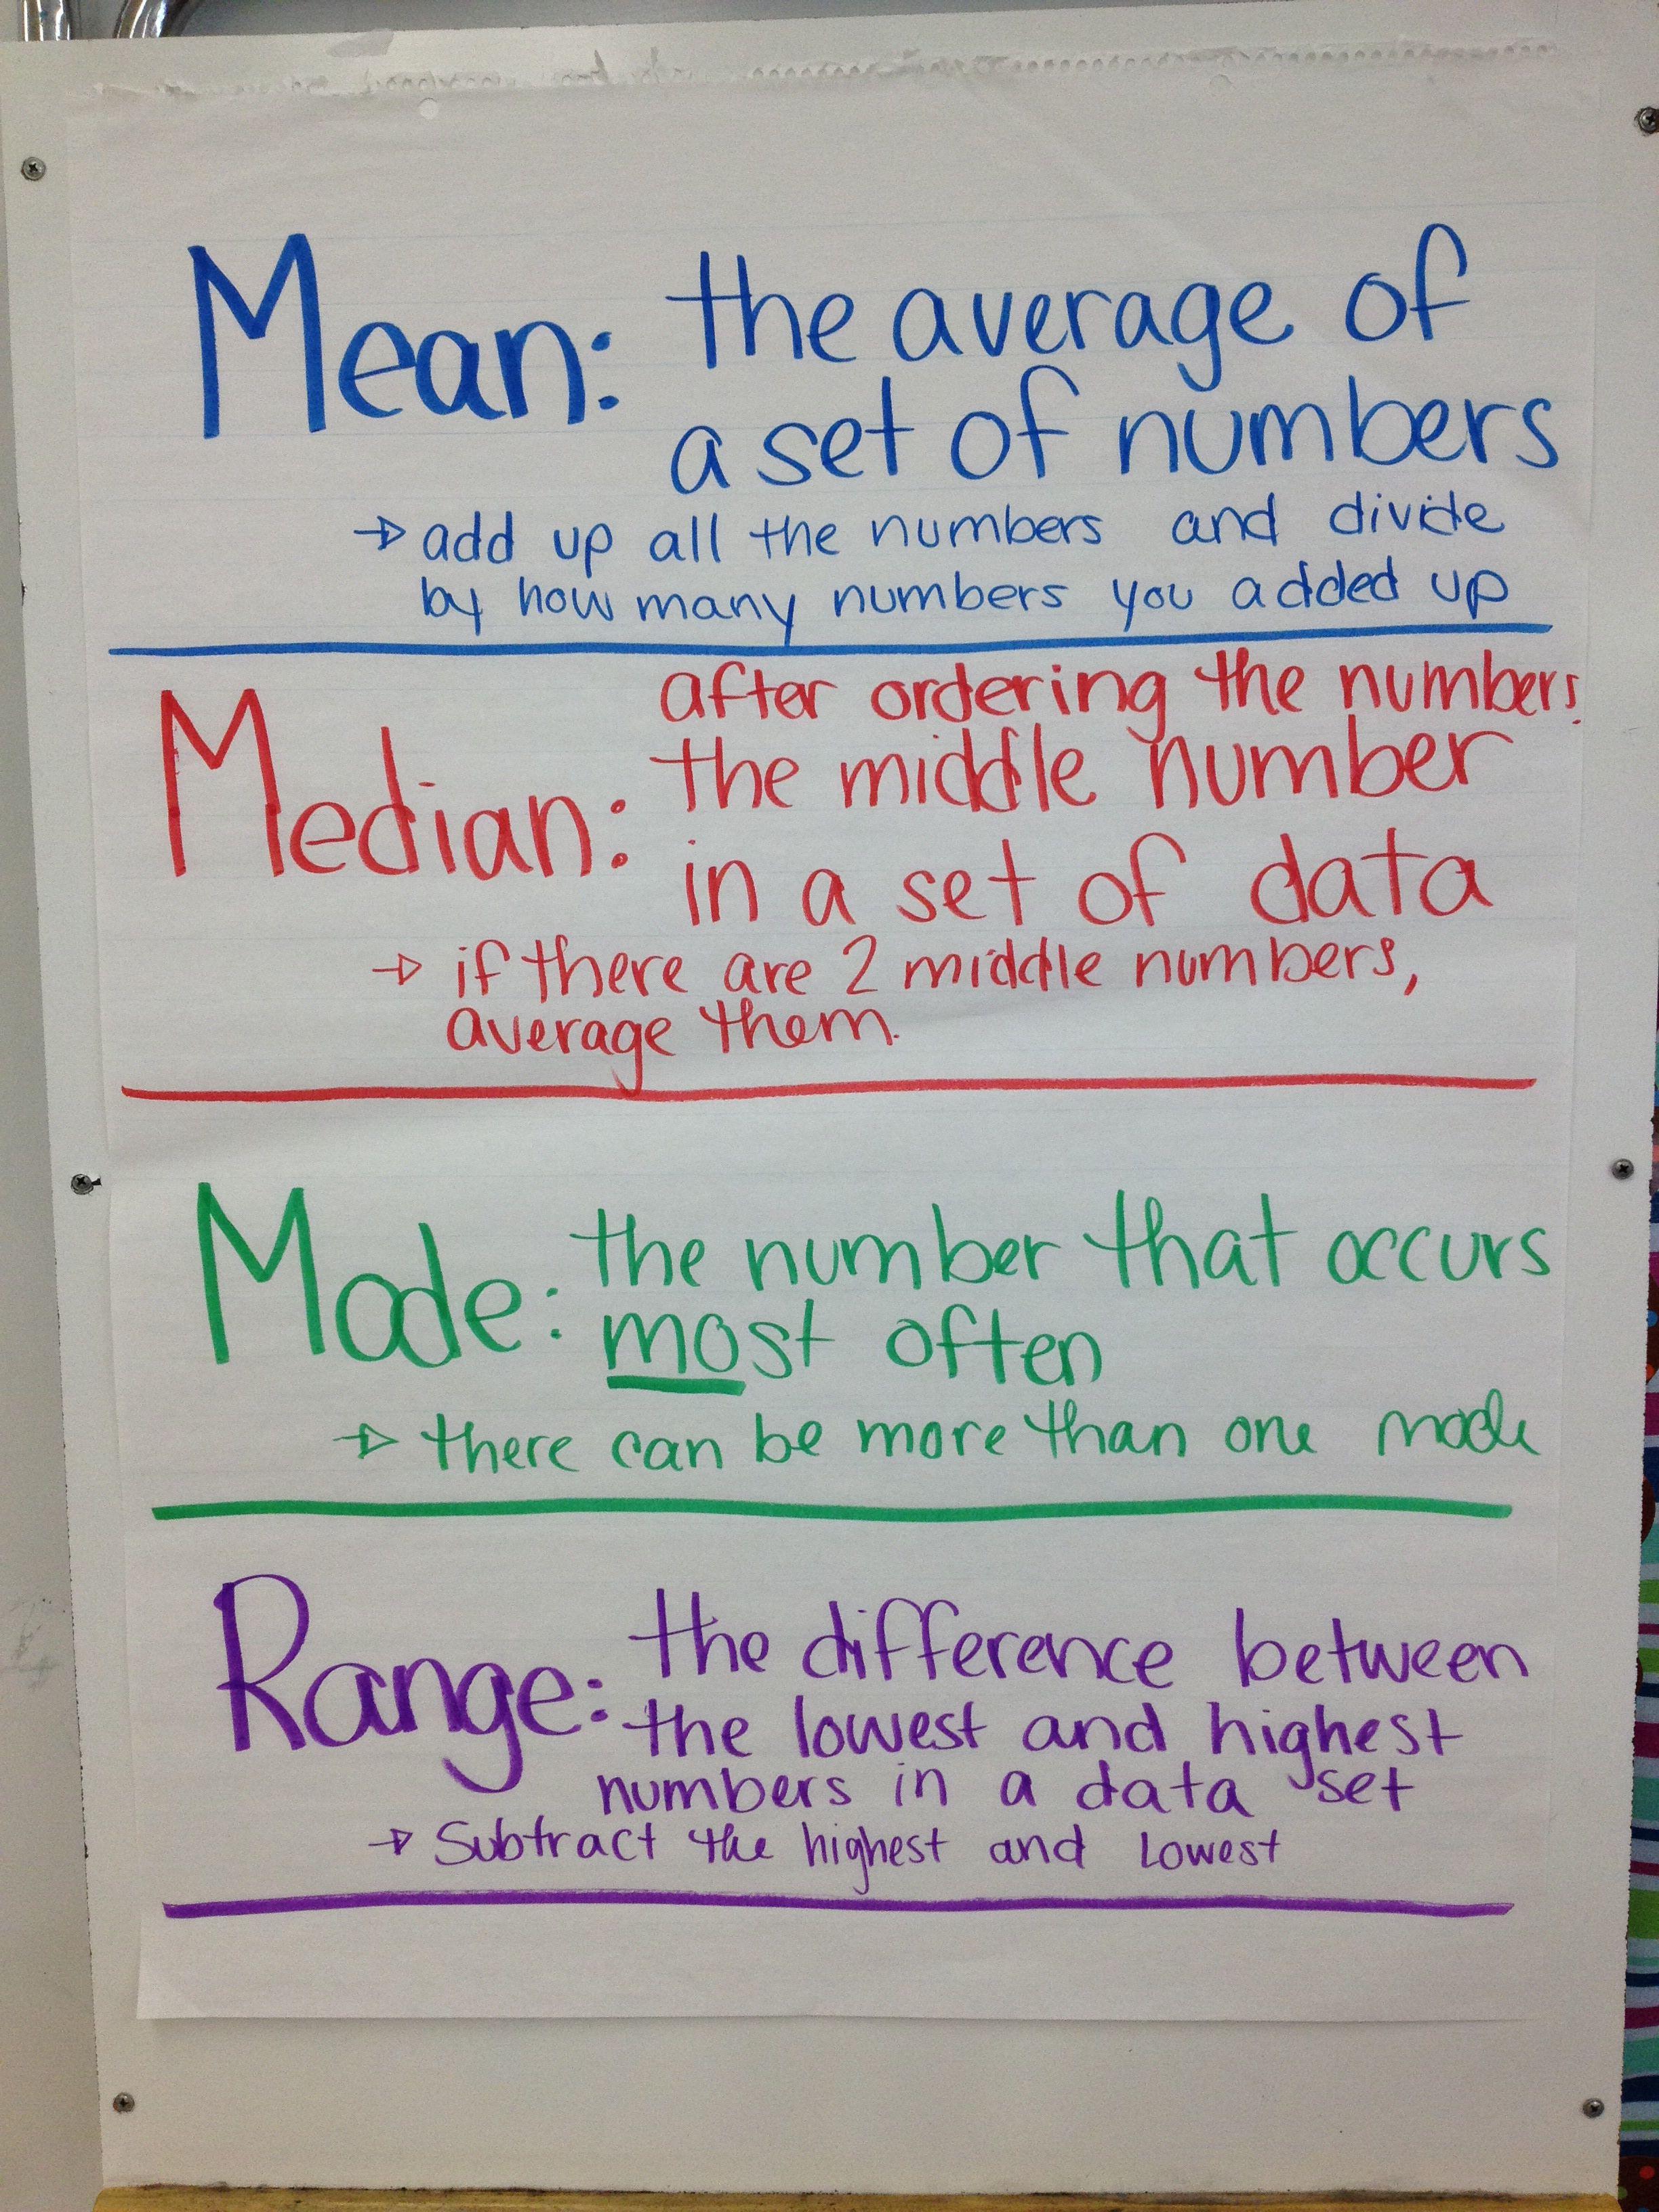 Mean median mode range anchor chart | 5th grade math things ...